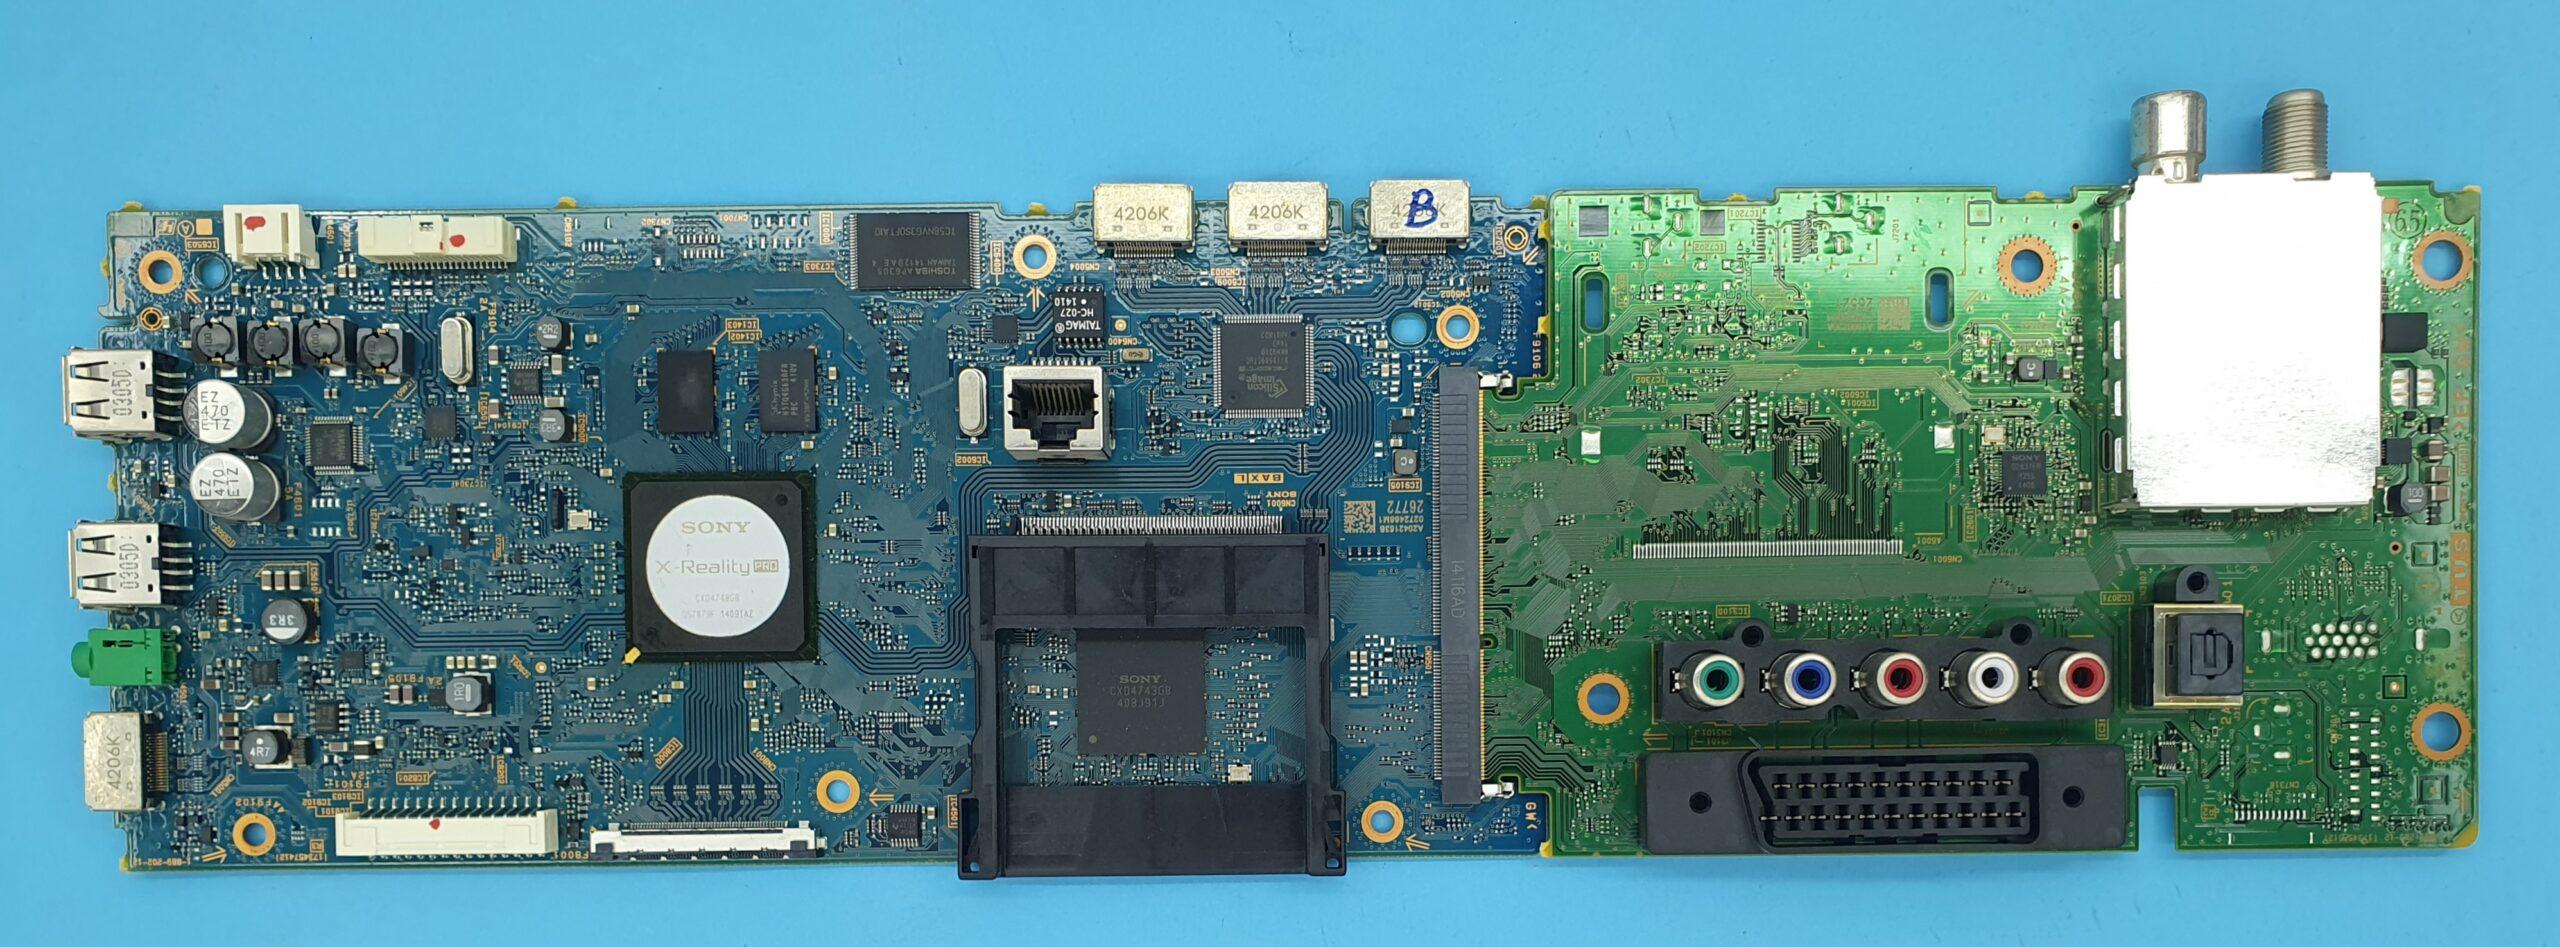 1-889-202-12 Sony Anakart (KDV DAHİL 400 TL)